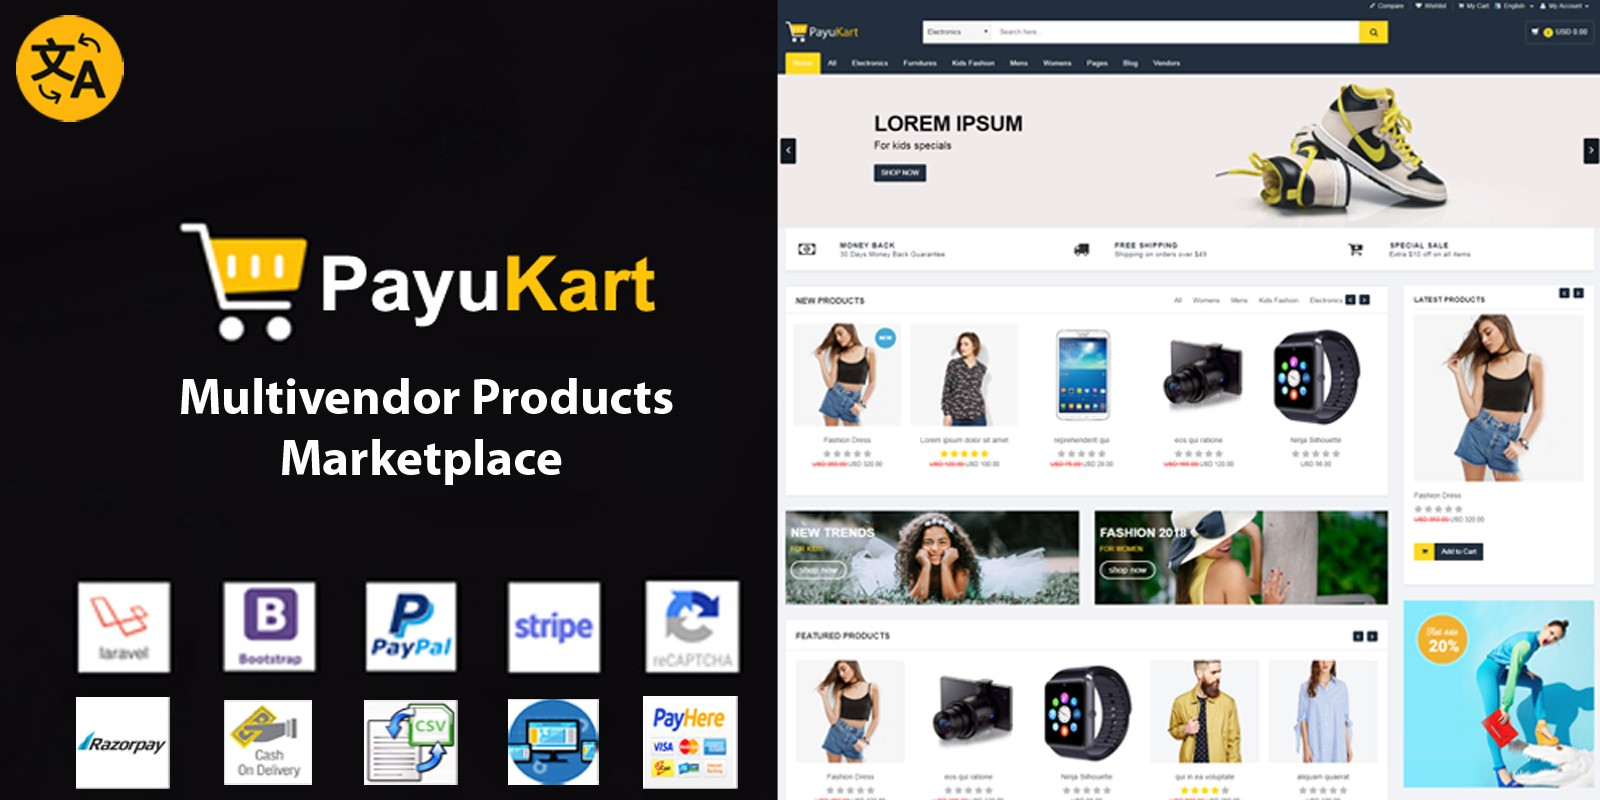 PayuKart - Multivendor Products Marketplace Script